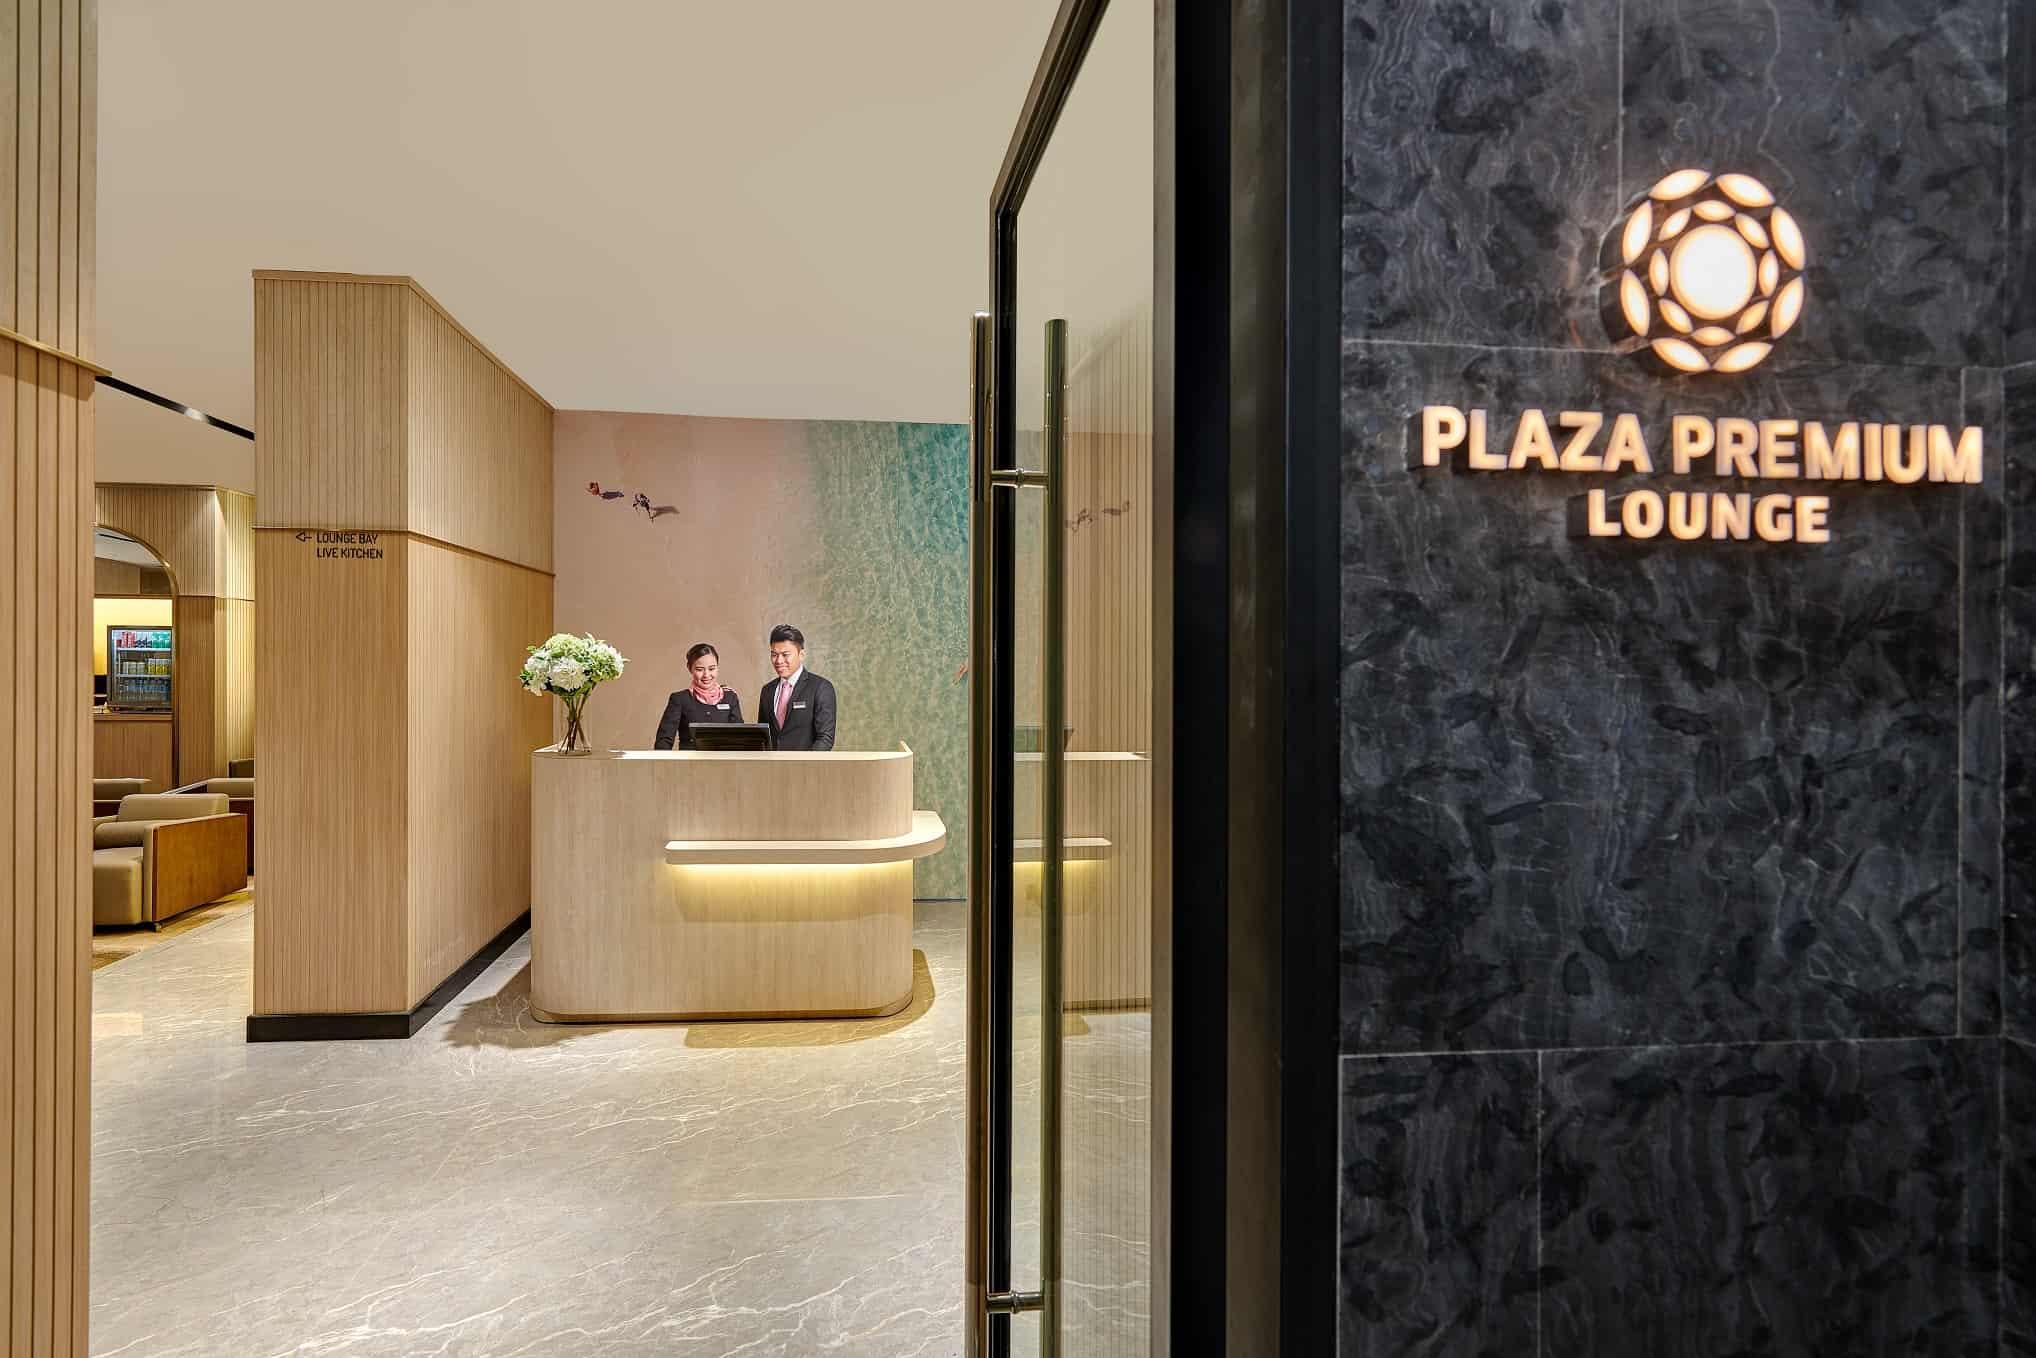 Plaza Premium Lounge Added Domestic Arrivals Lounge  at Mactan Cebu International Airport